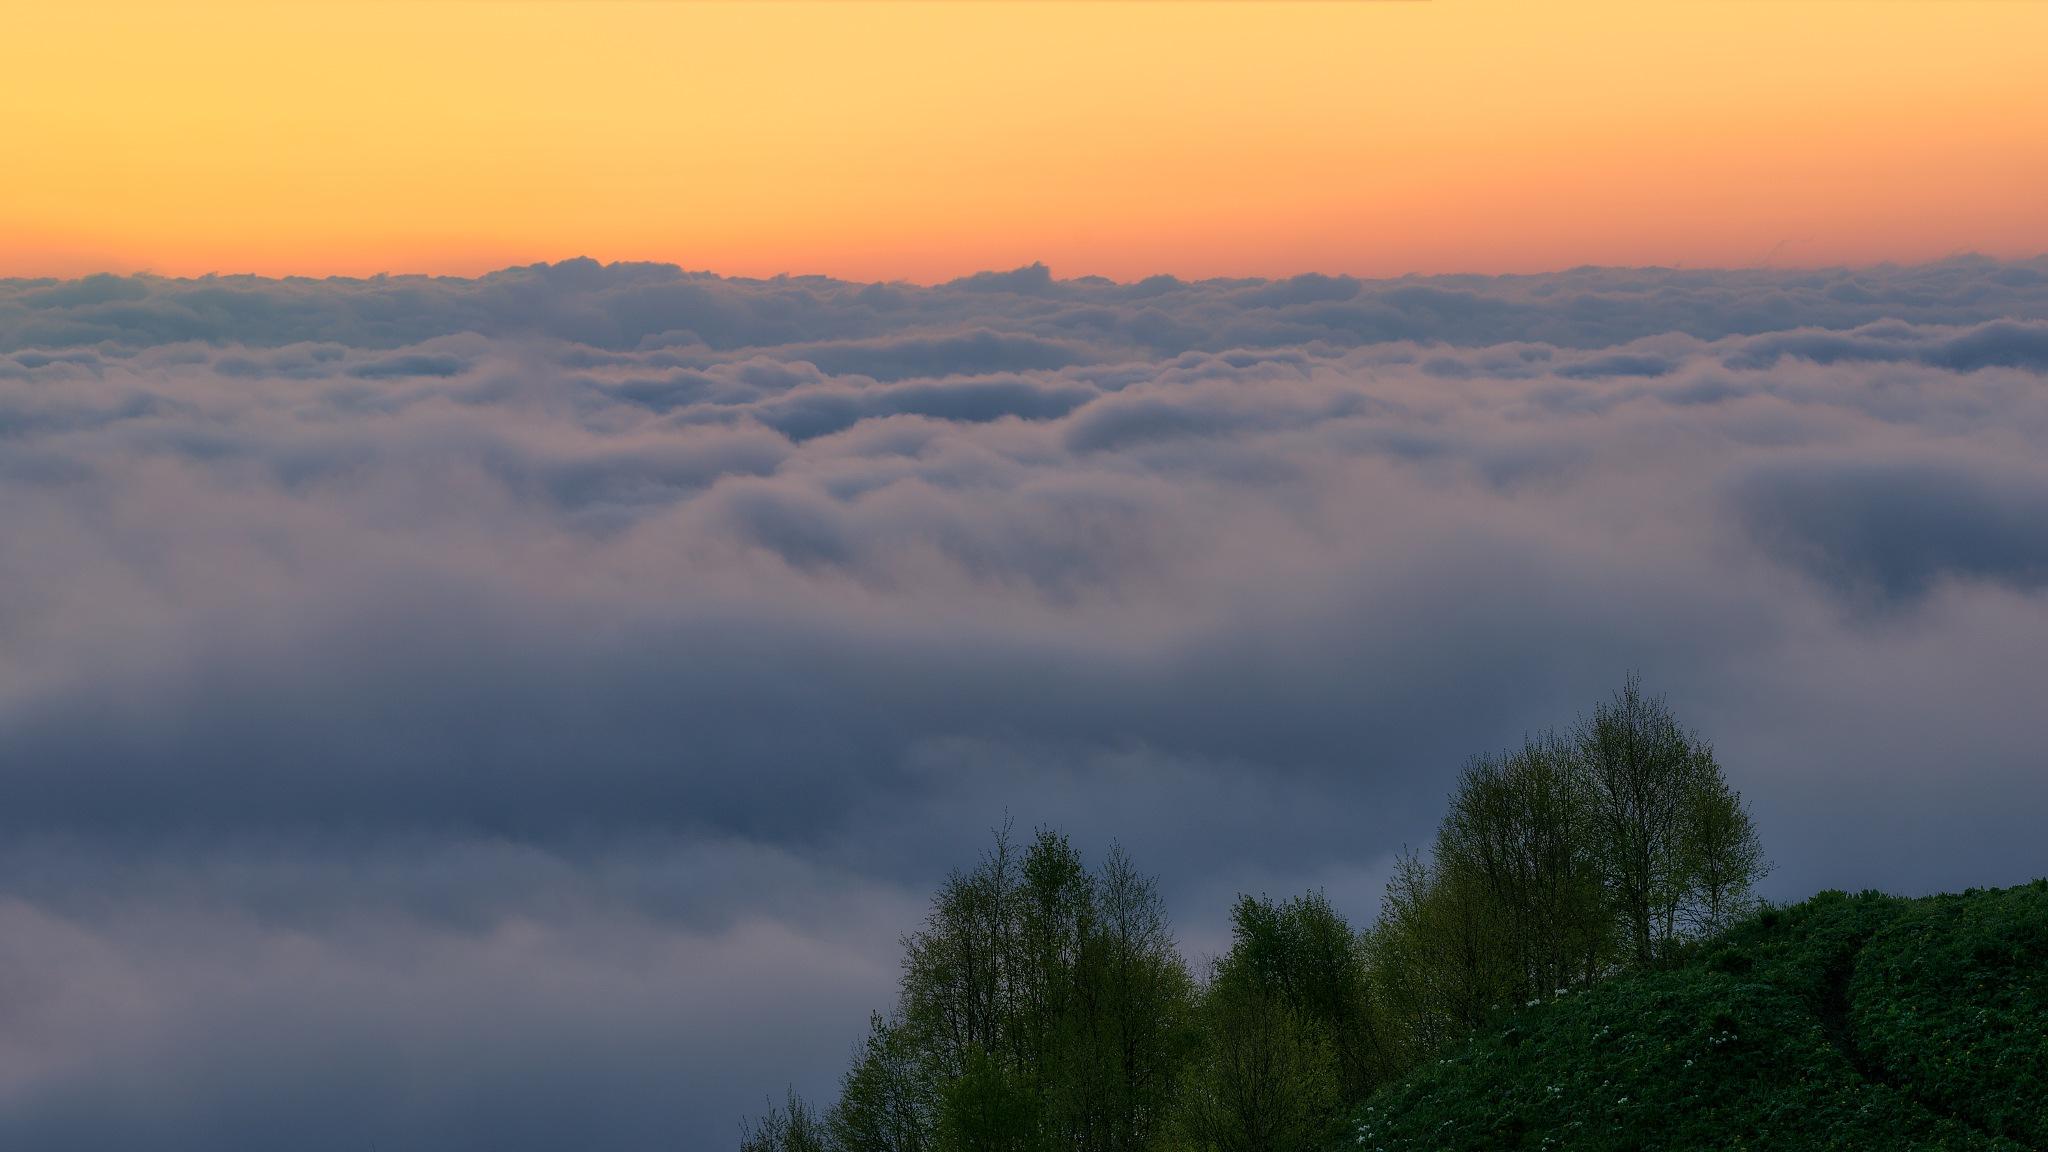 I'll show you the dawn by Alexander Plekhanov